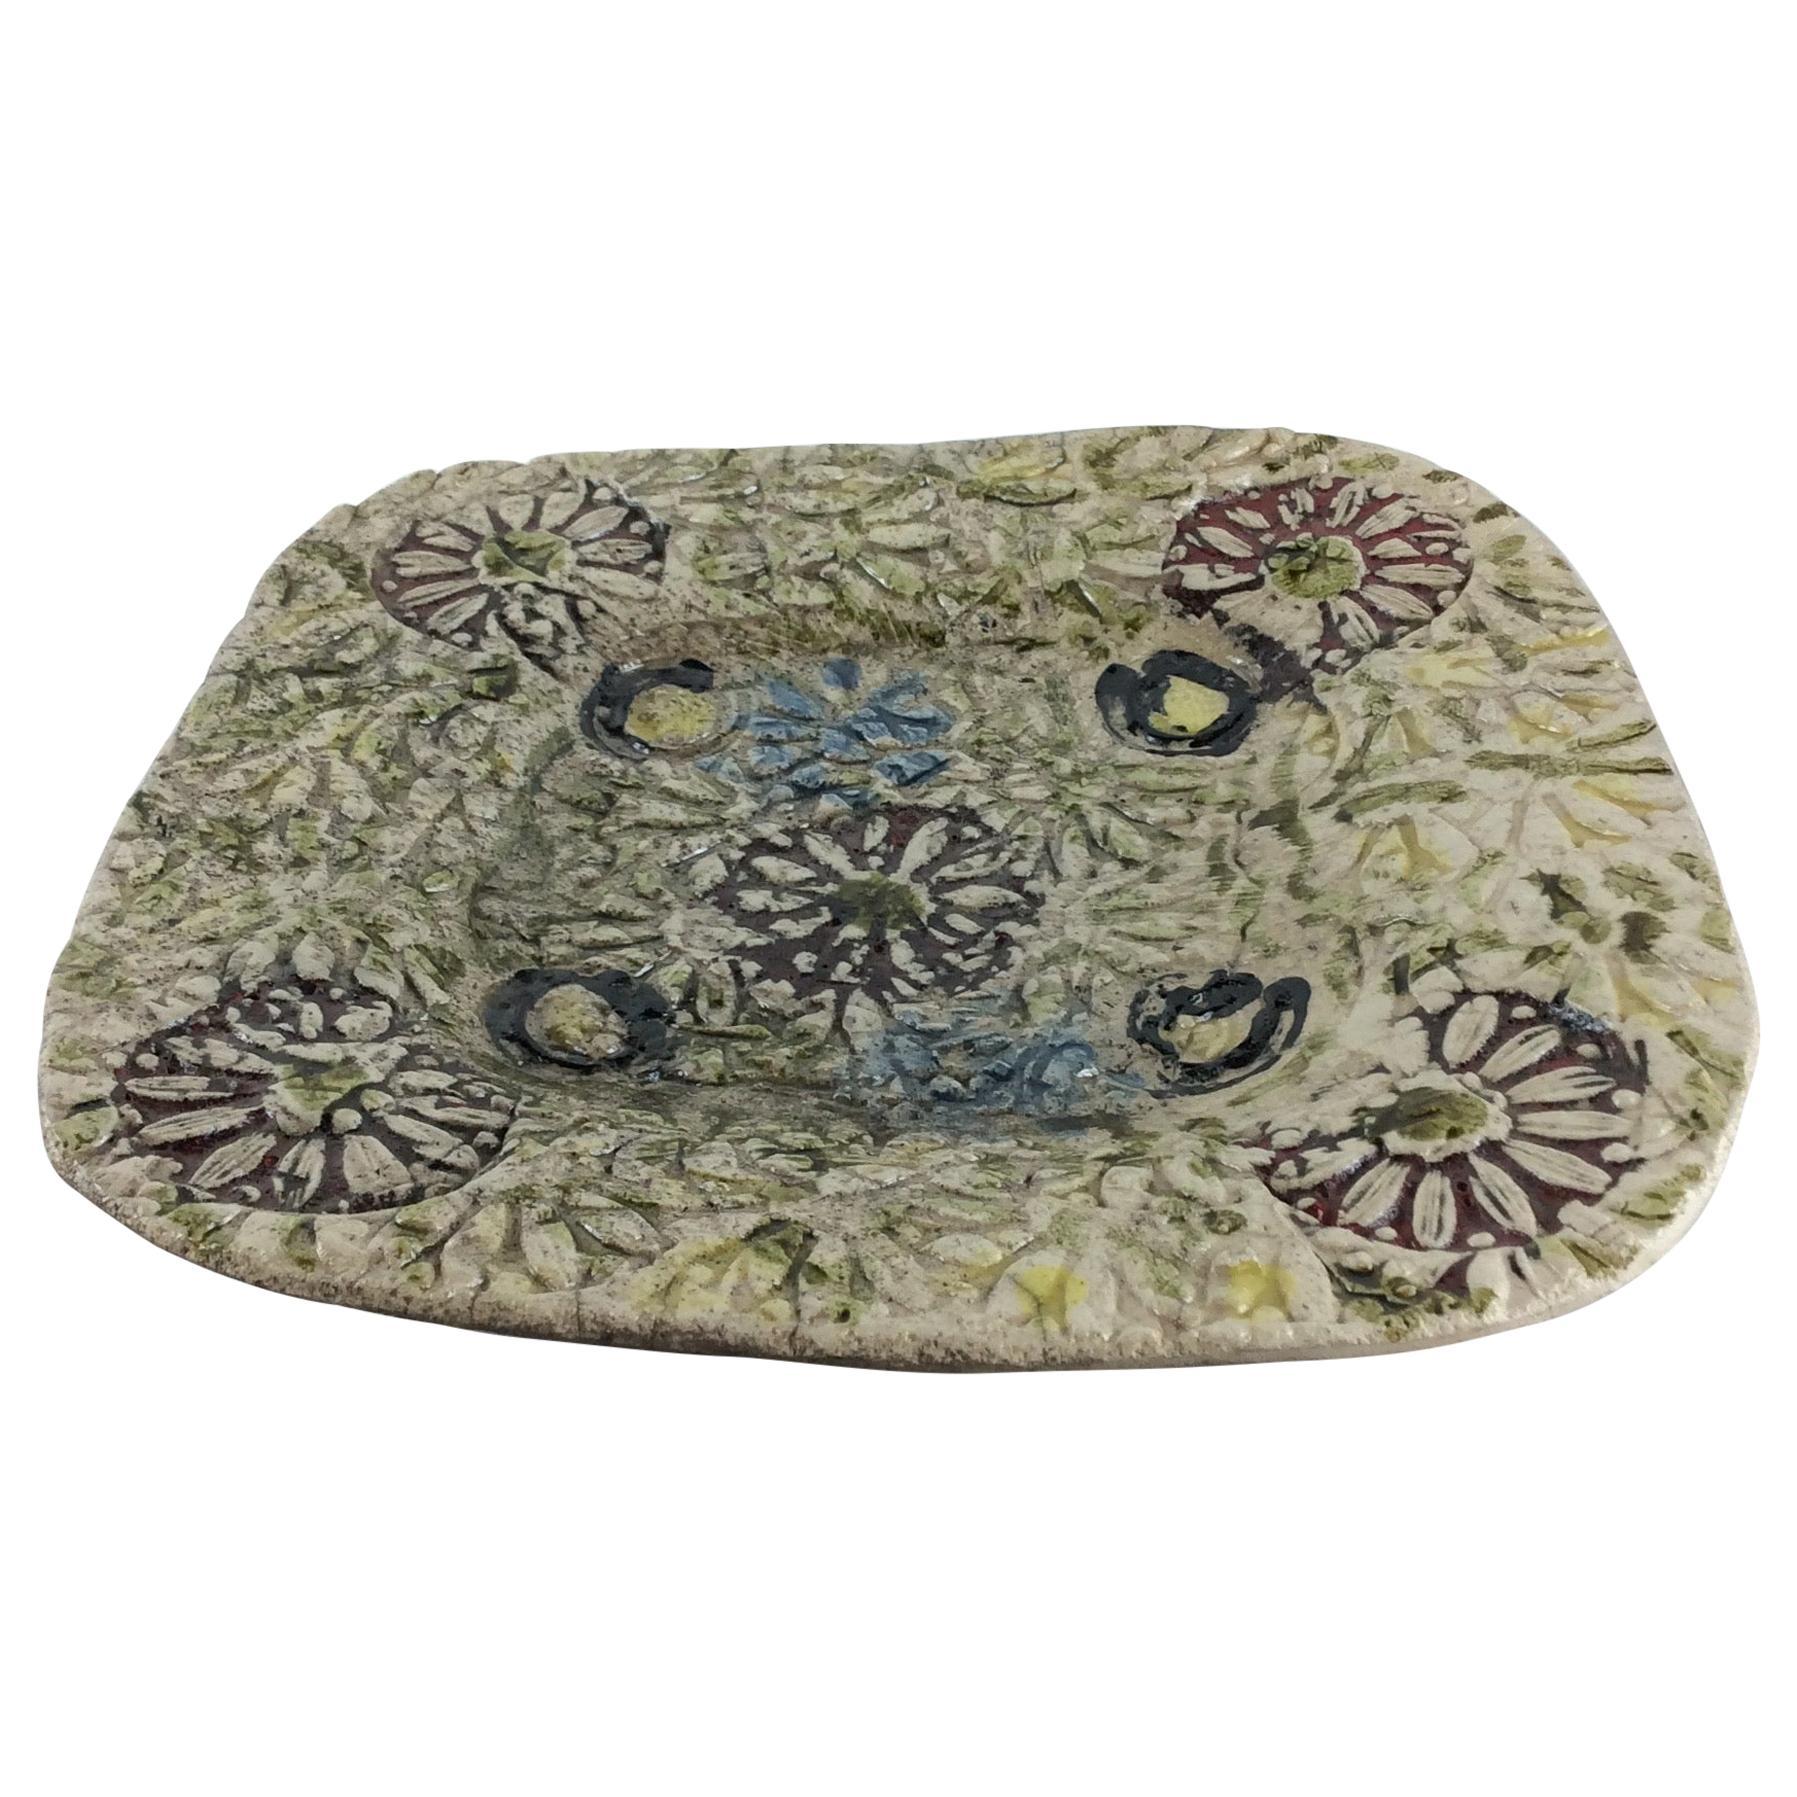 French Midcentury Decorative Ceramic Plate